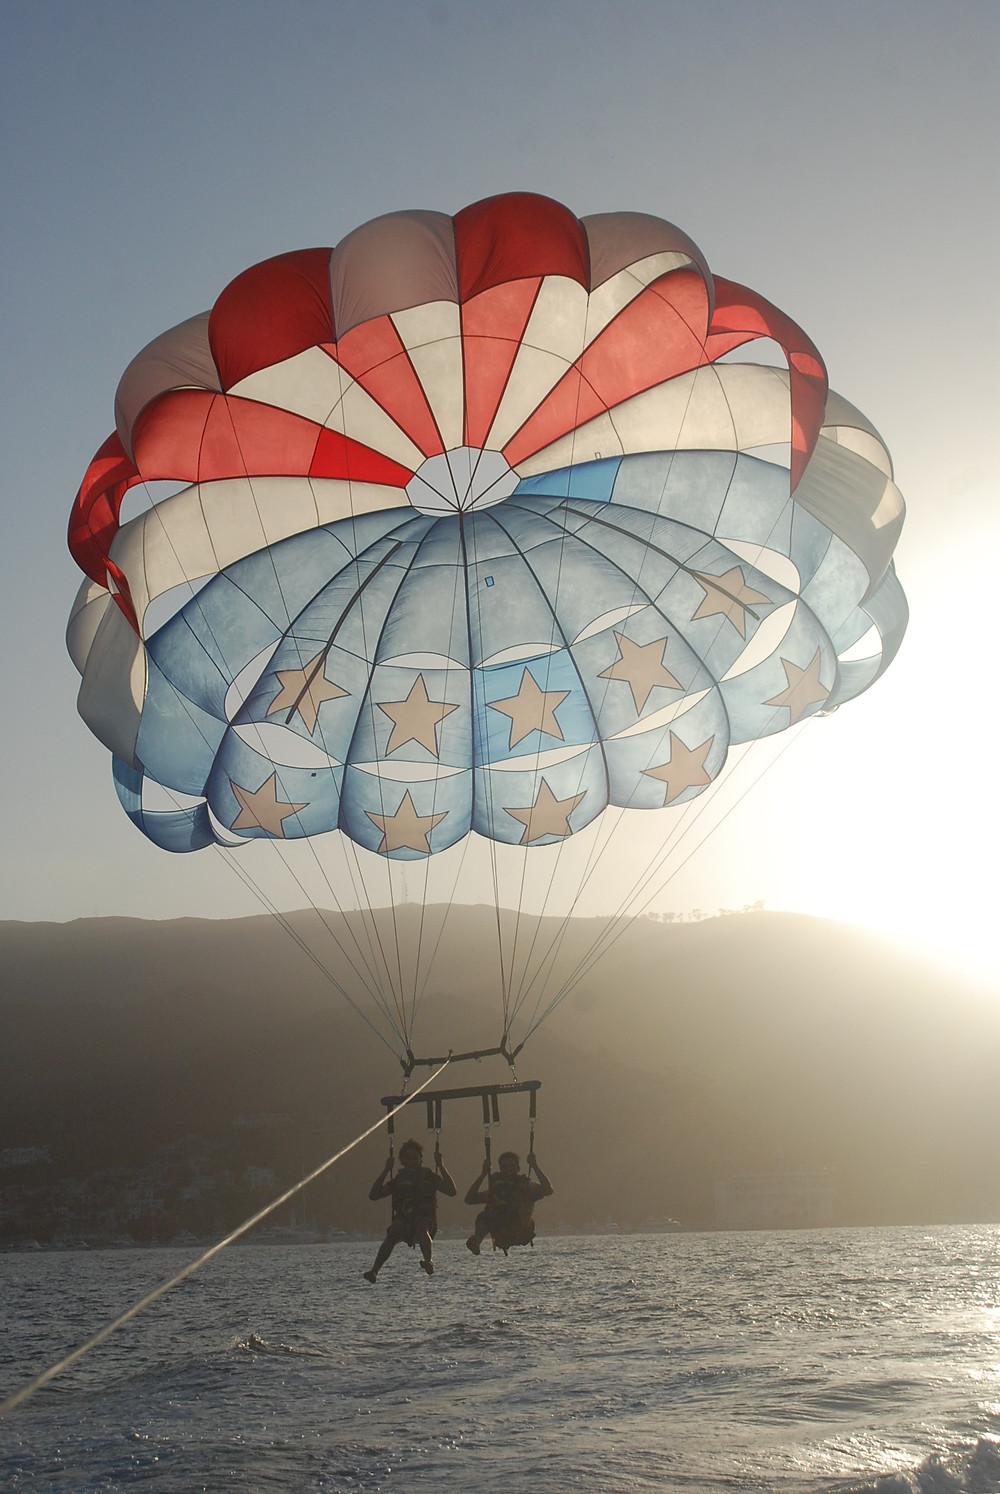 Parasailing in Catalina Island, California USA during summer weather